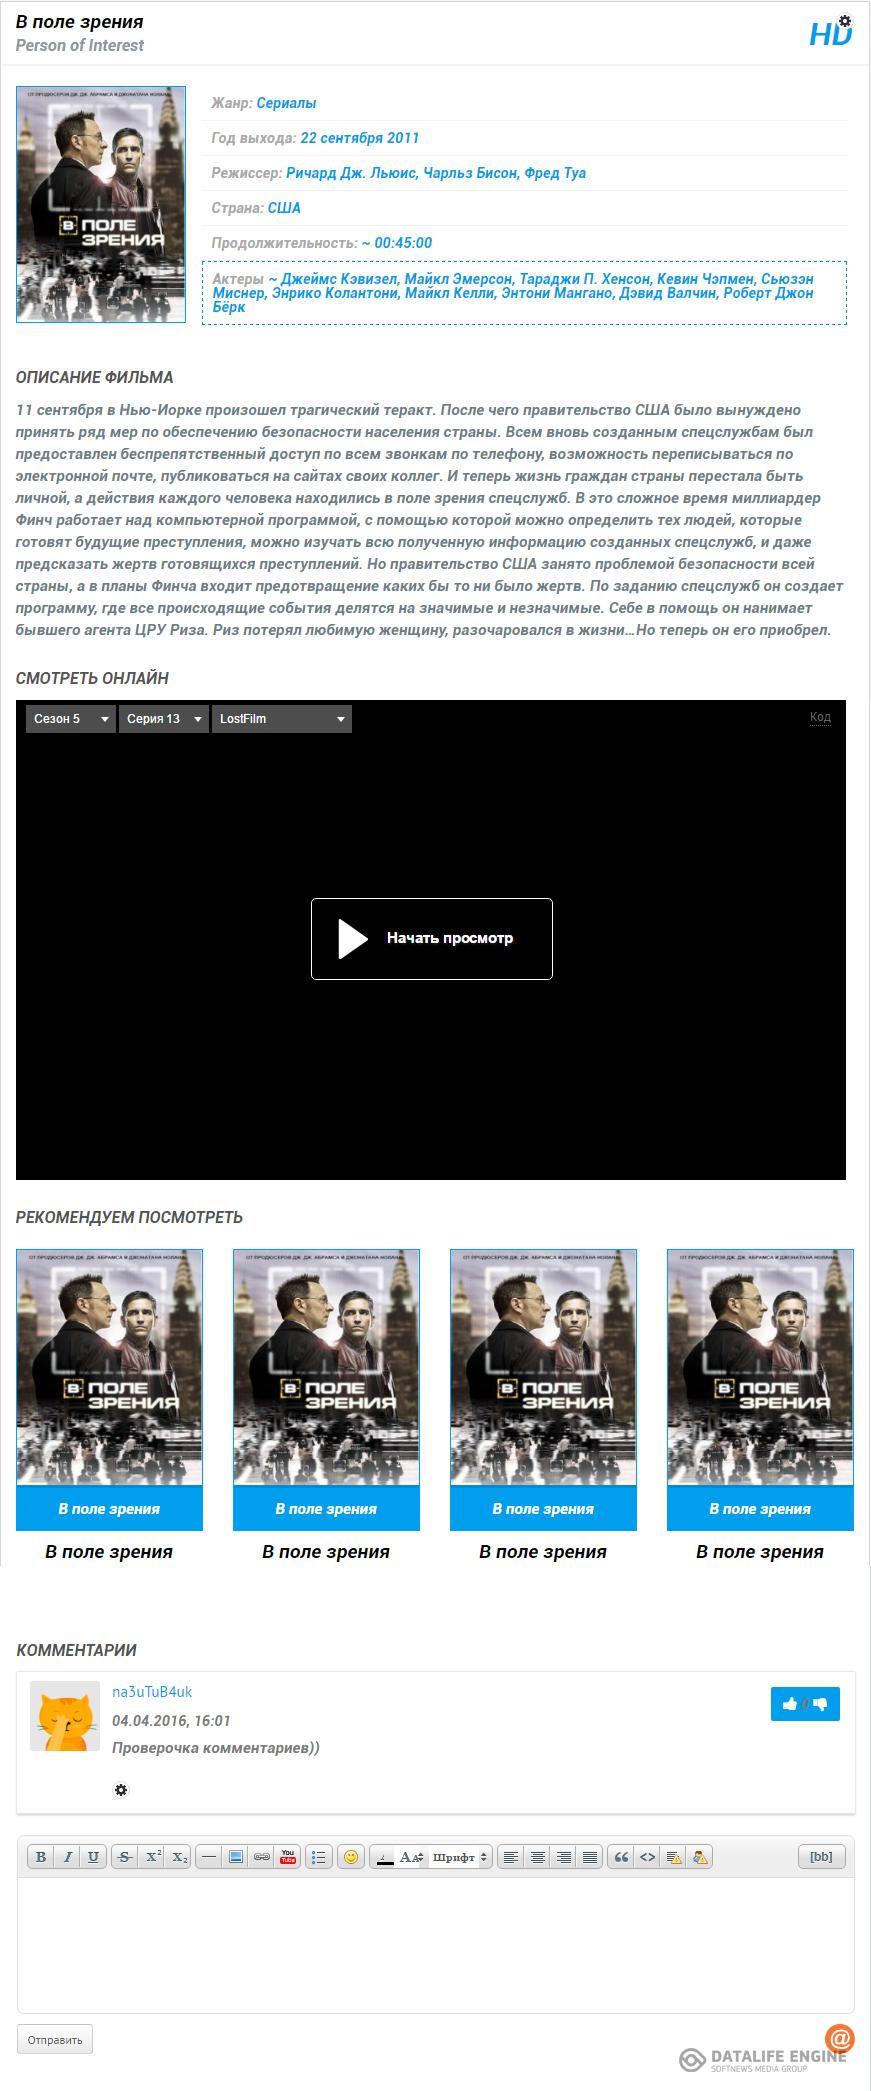 Шаблон CinemaZone для uCoz